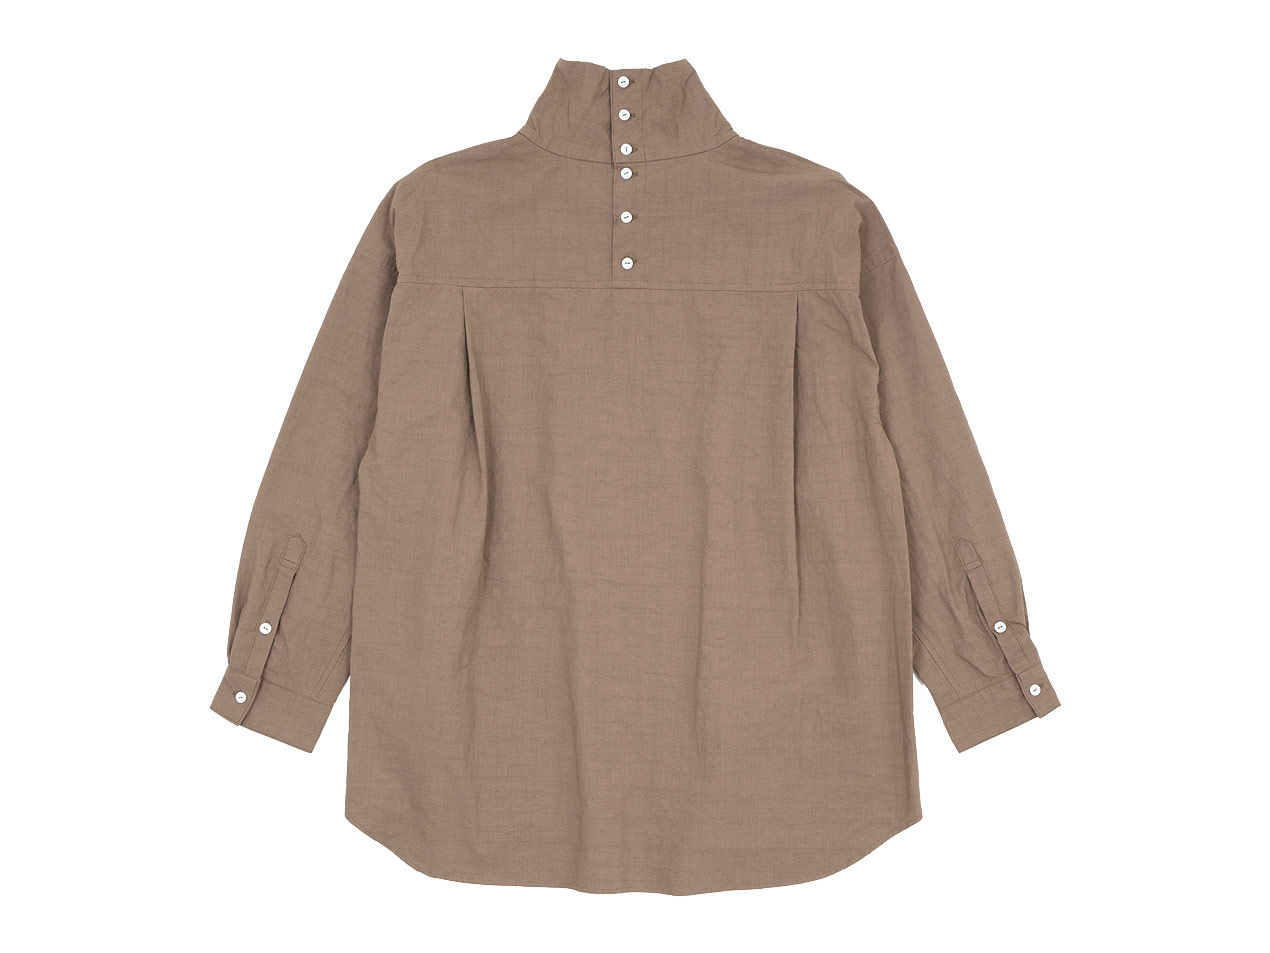 TOUJOURS High Neck Big Shirt